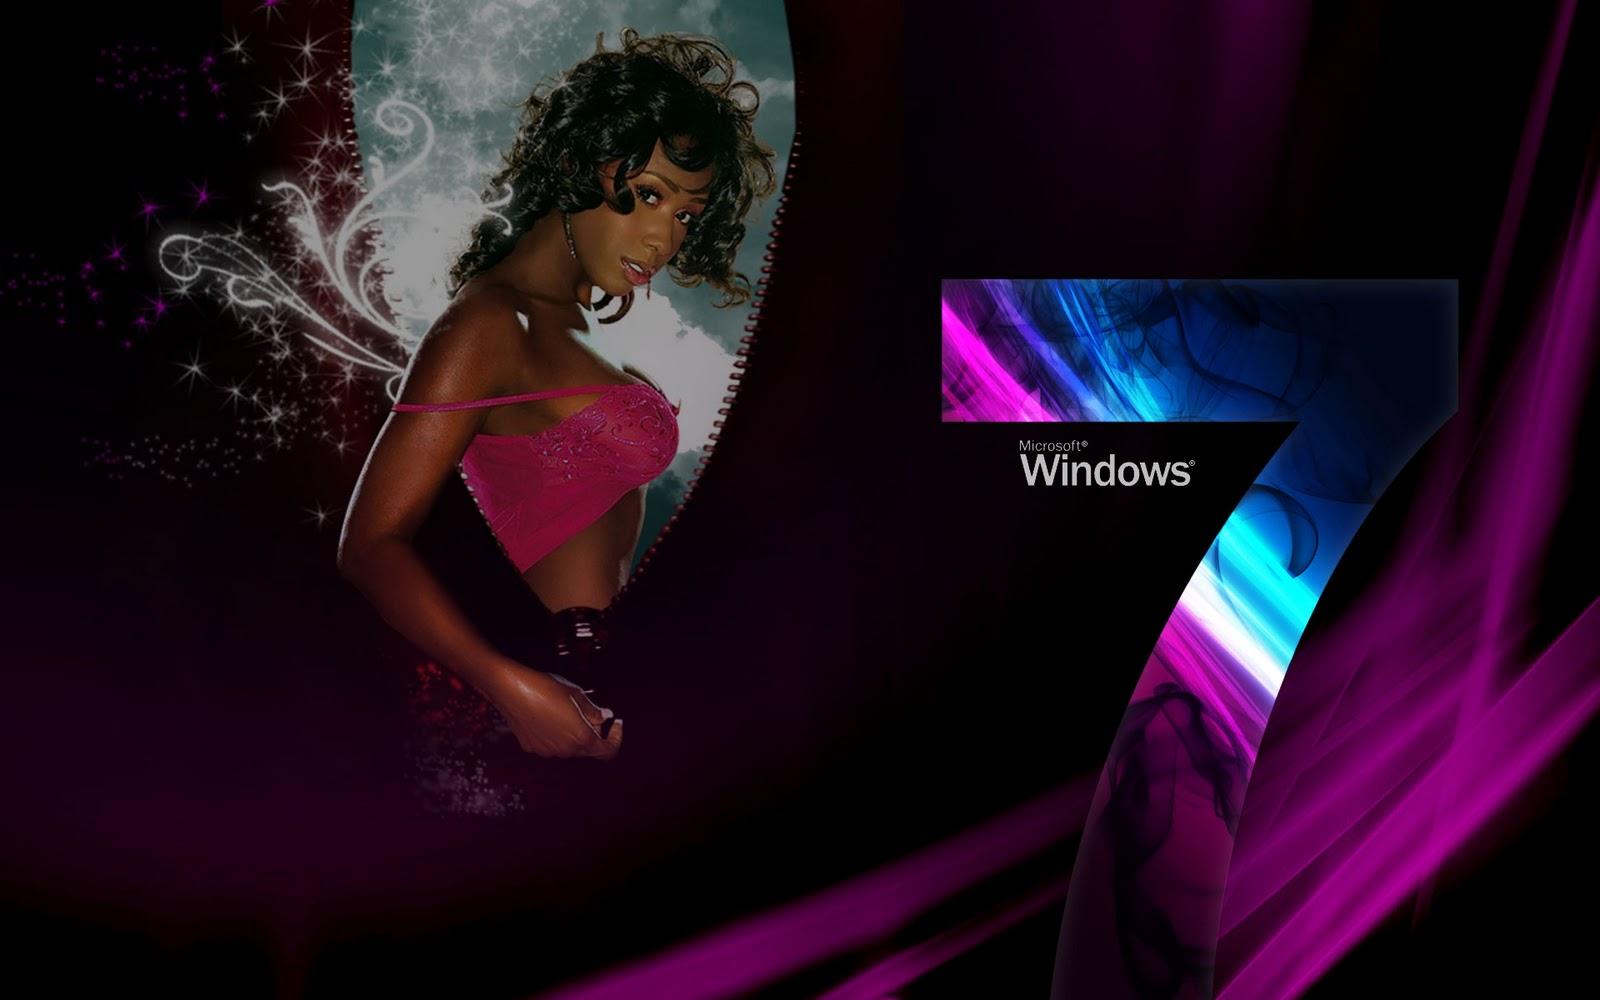 windows 7 animated wallpaper   Desktop Wallpaper 1600x1000